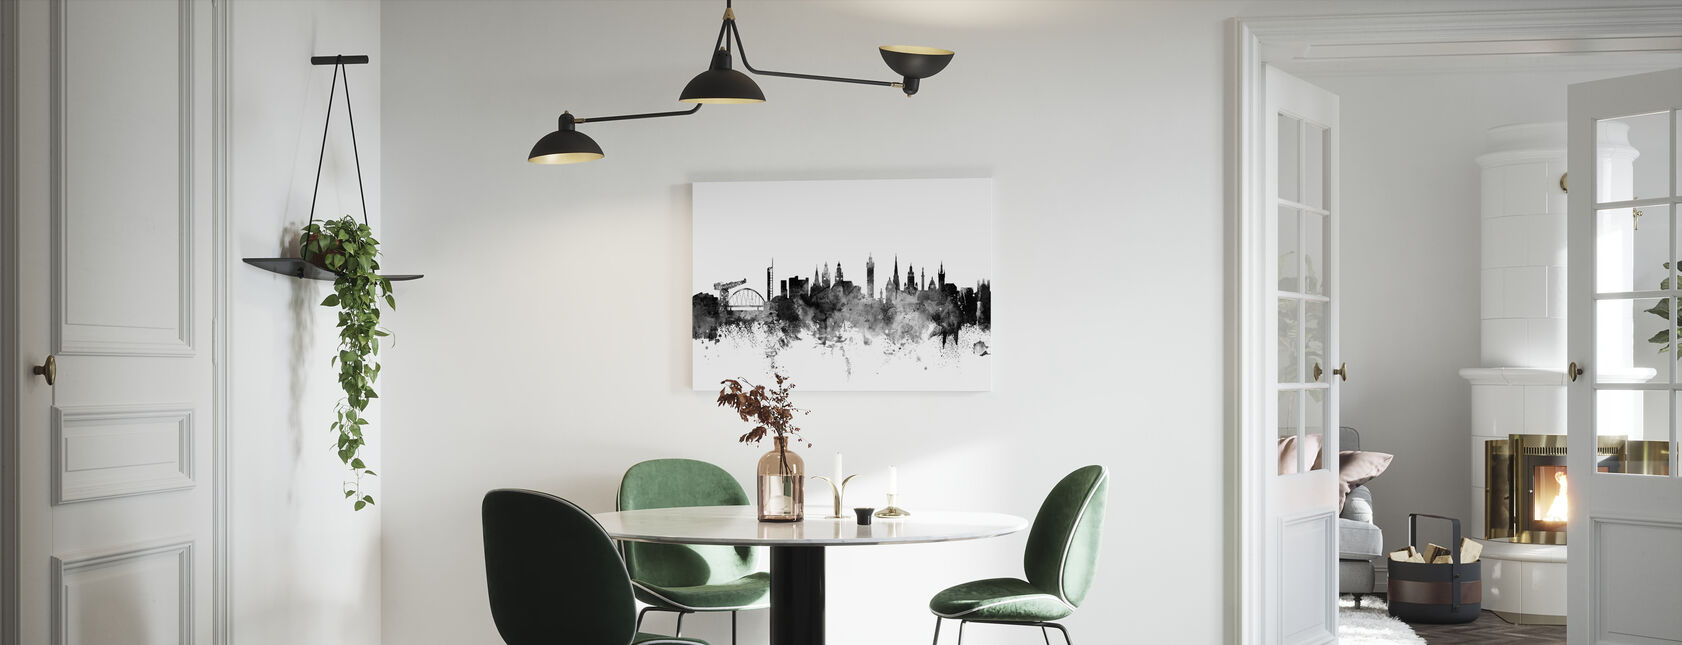 Glasgow Scotland Skyline Black - Canvas print - Kitchen